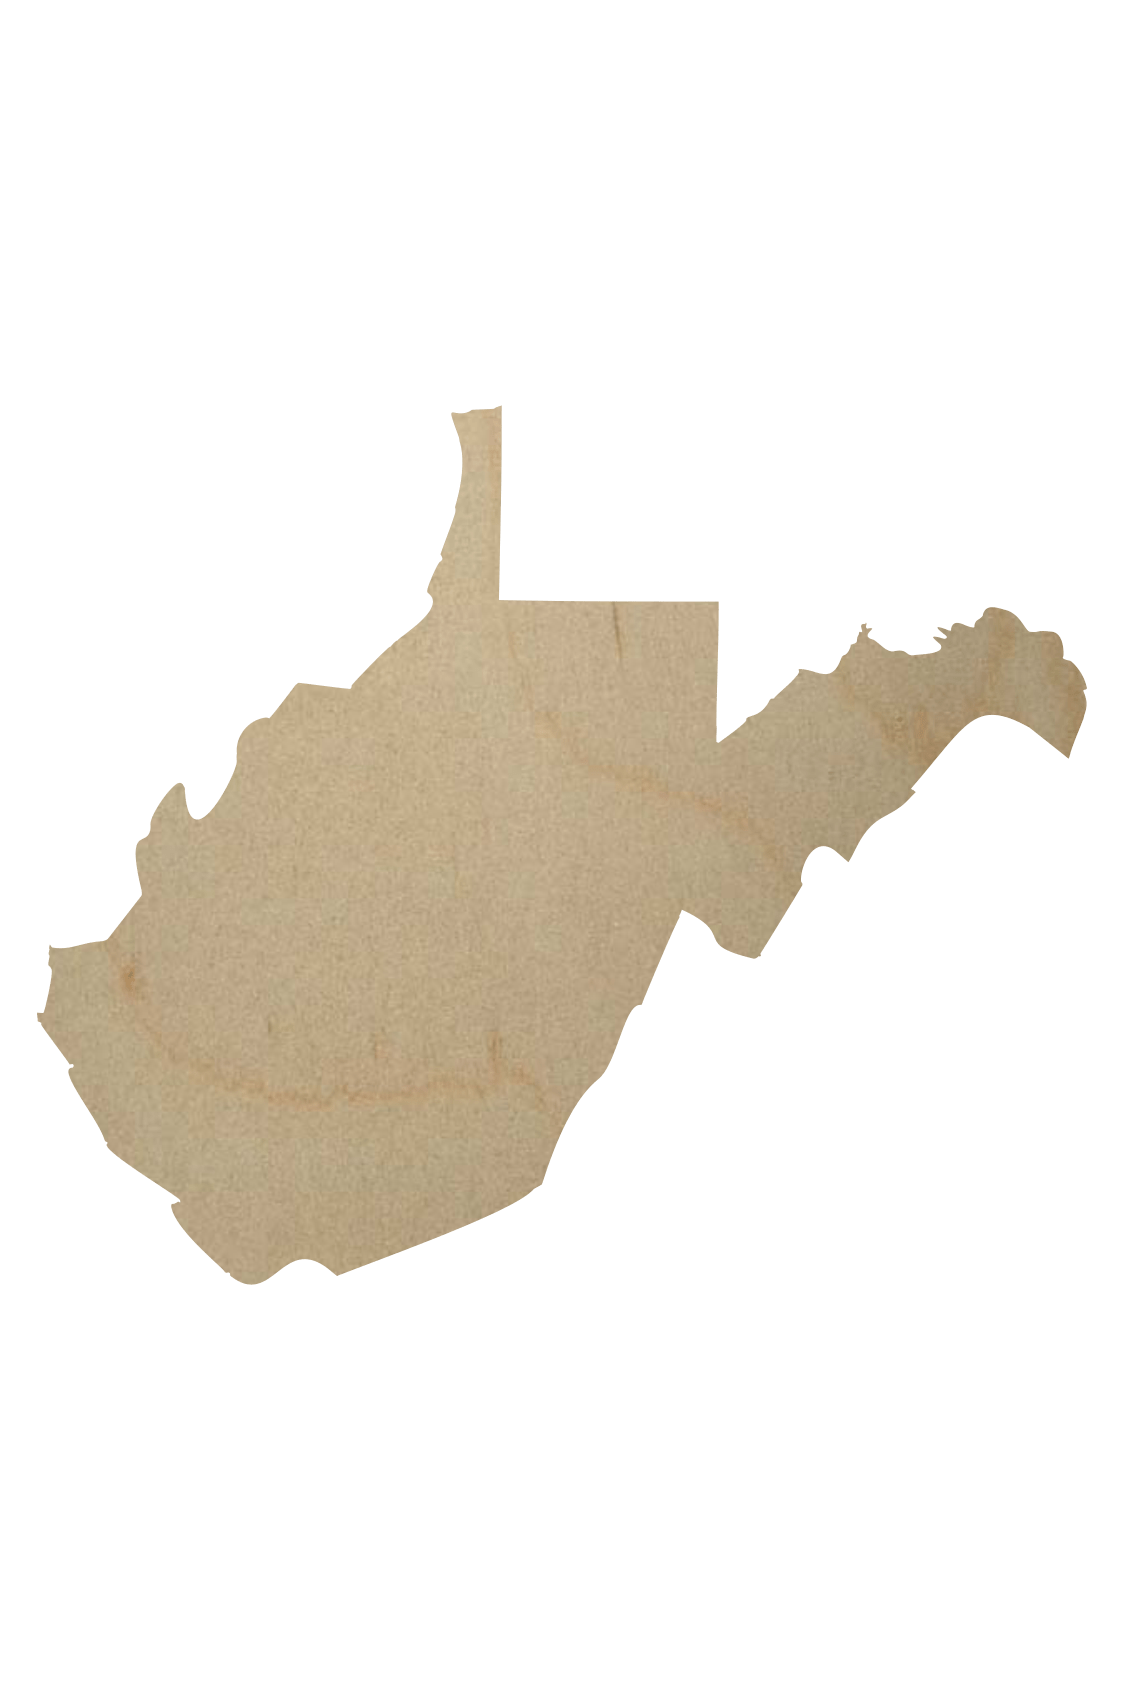 West Virginia State Wood Shape